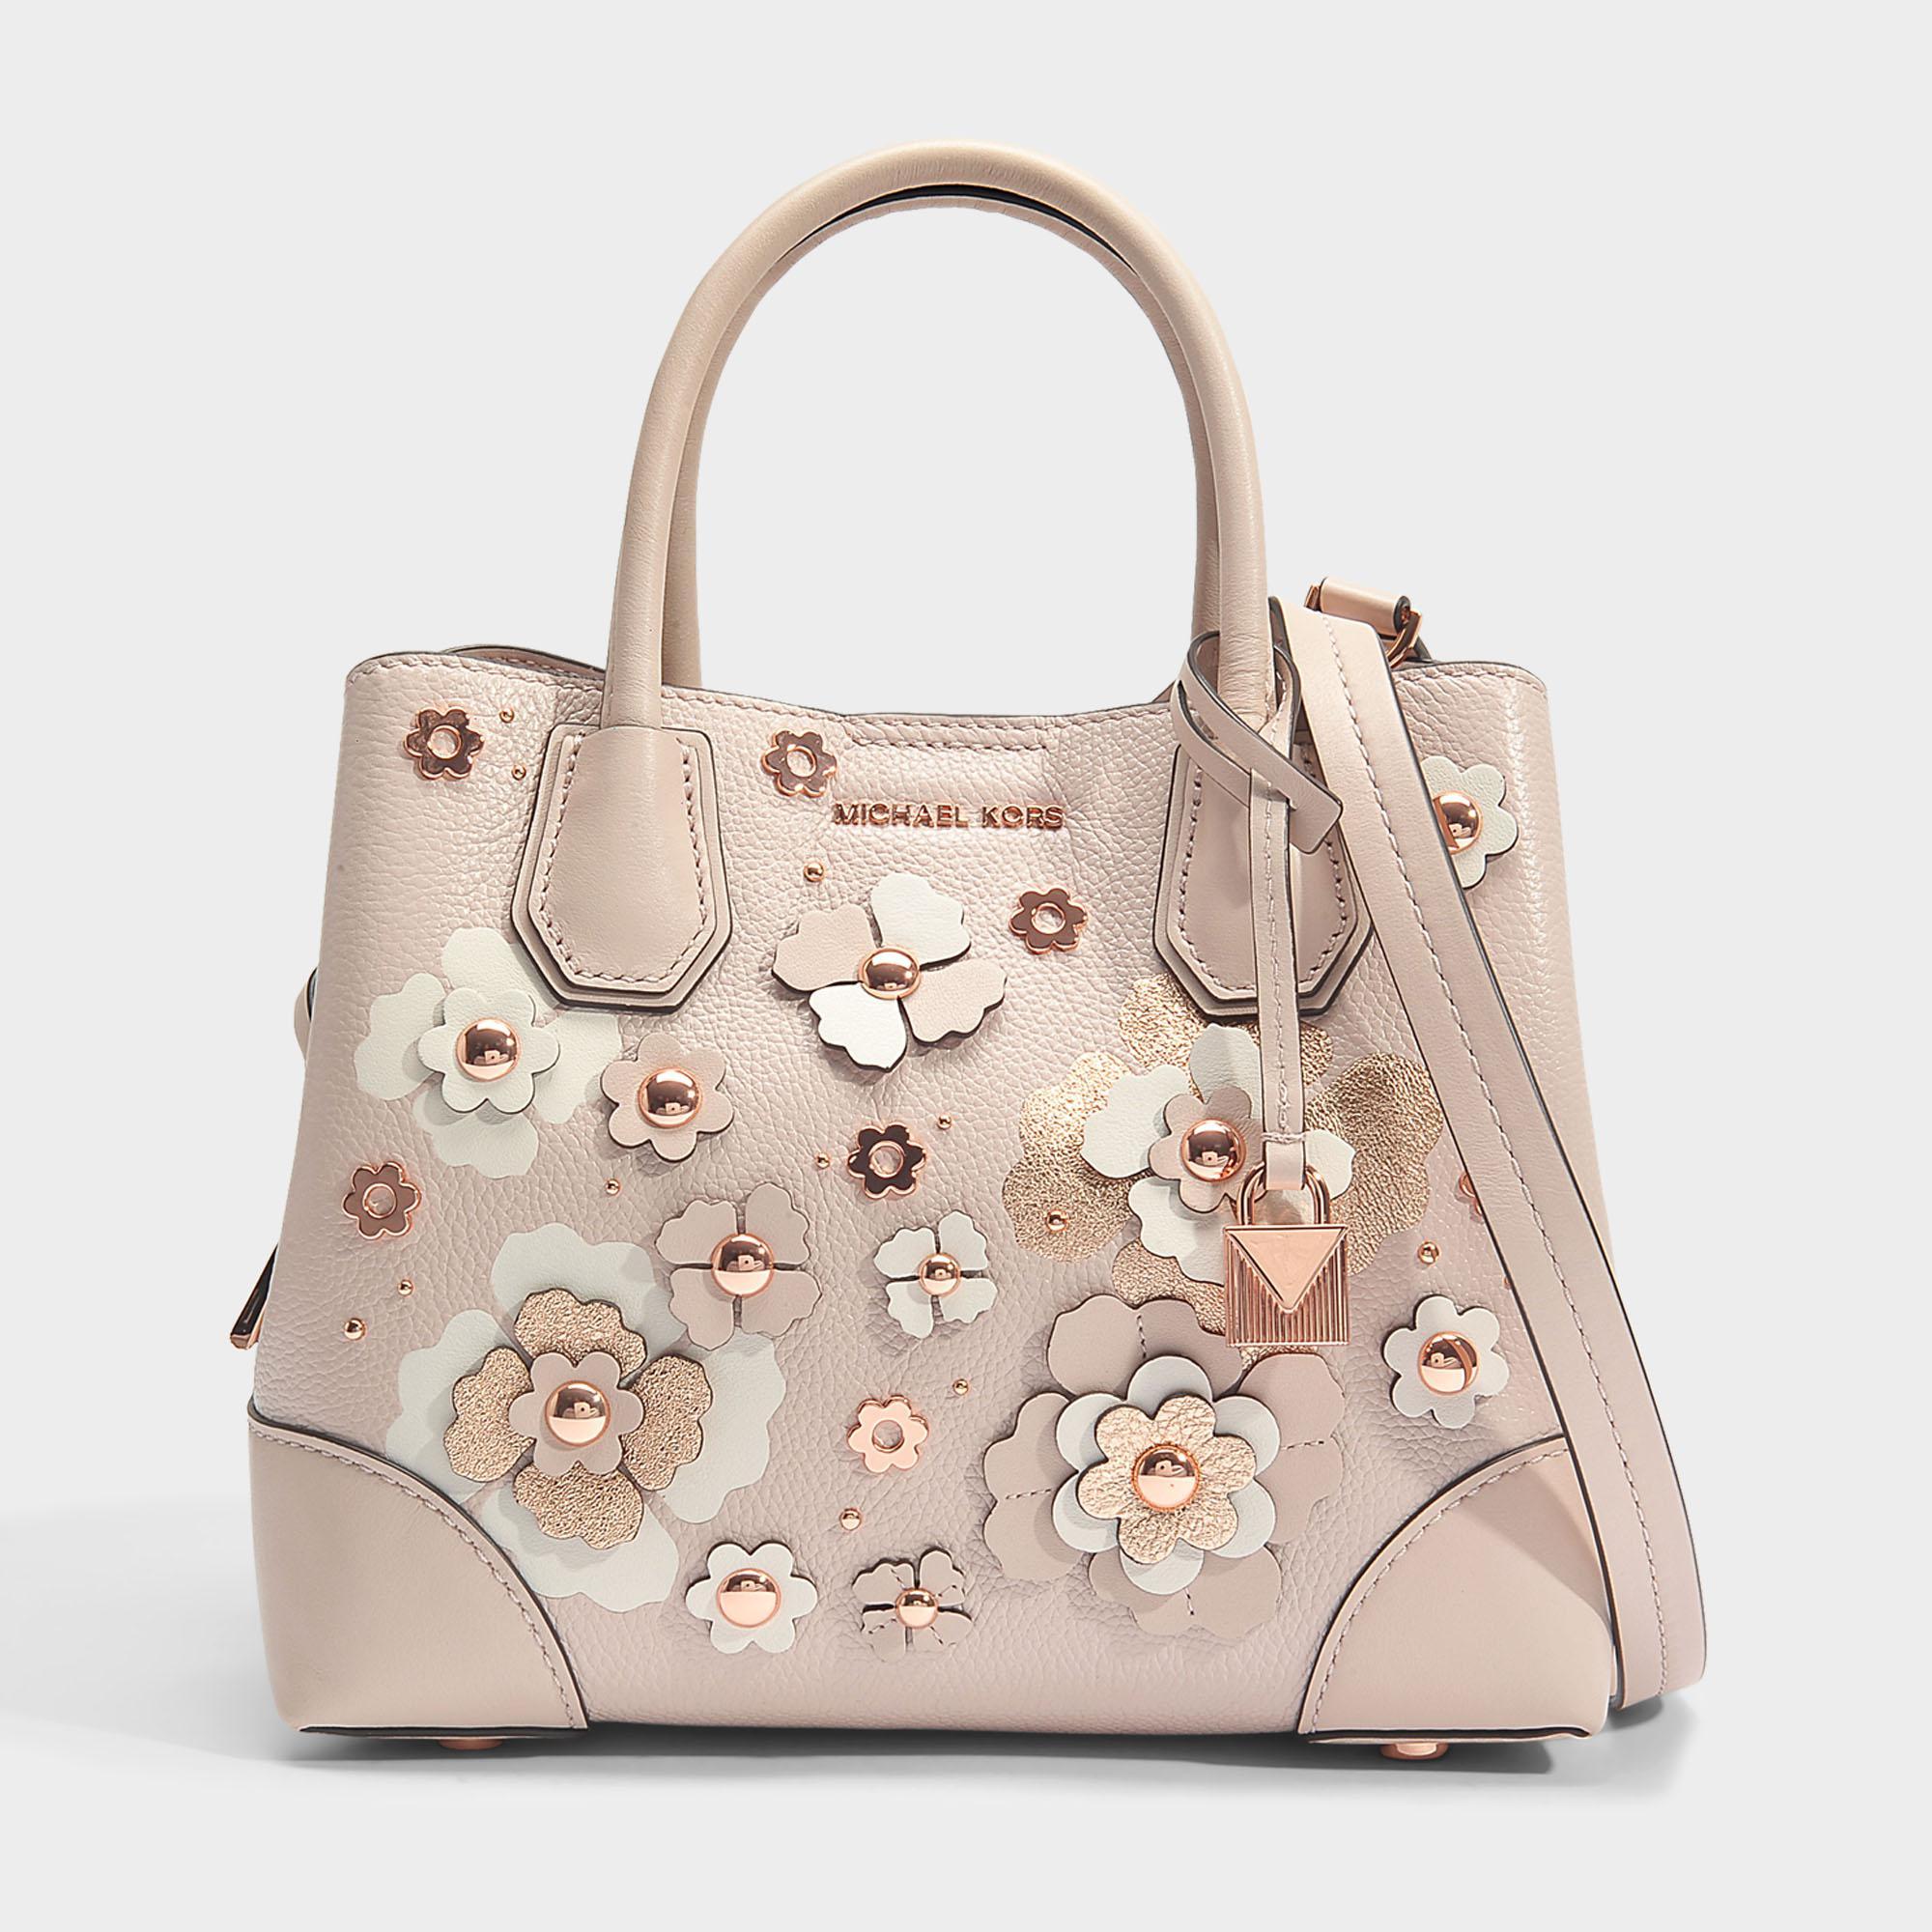 MICHAEL Michael Kors. Women s Mercer Gallery Small Center Zip Satchel Bag  In Soft Pink Double Sided Mercer Pebble Leather e4888288de